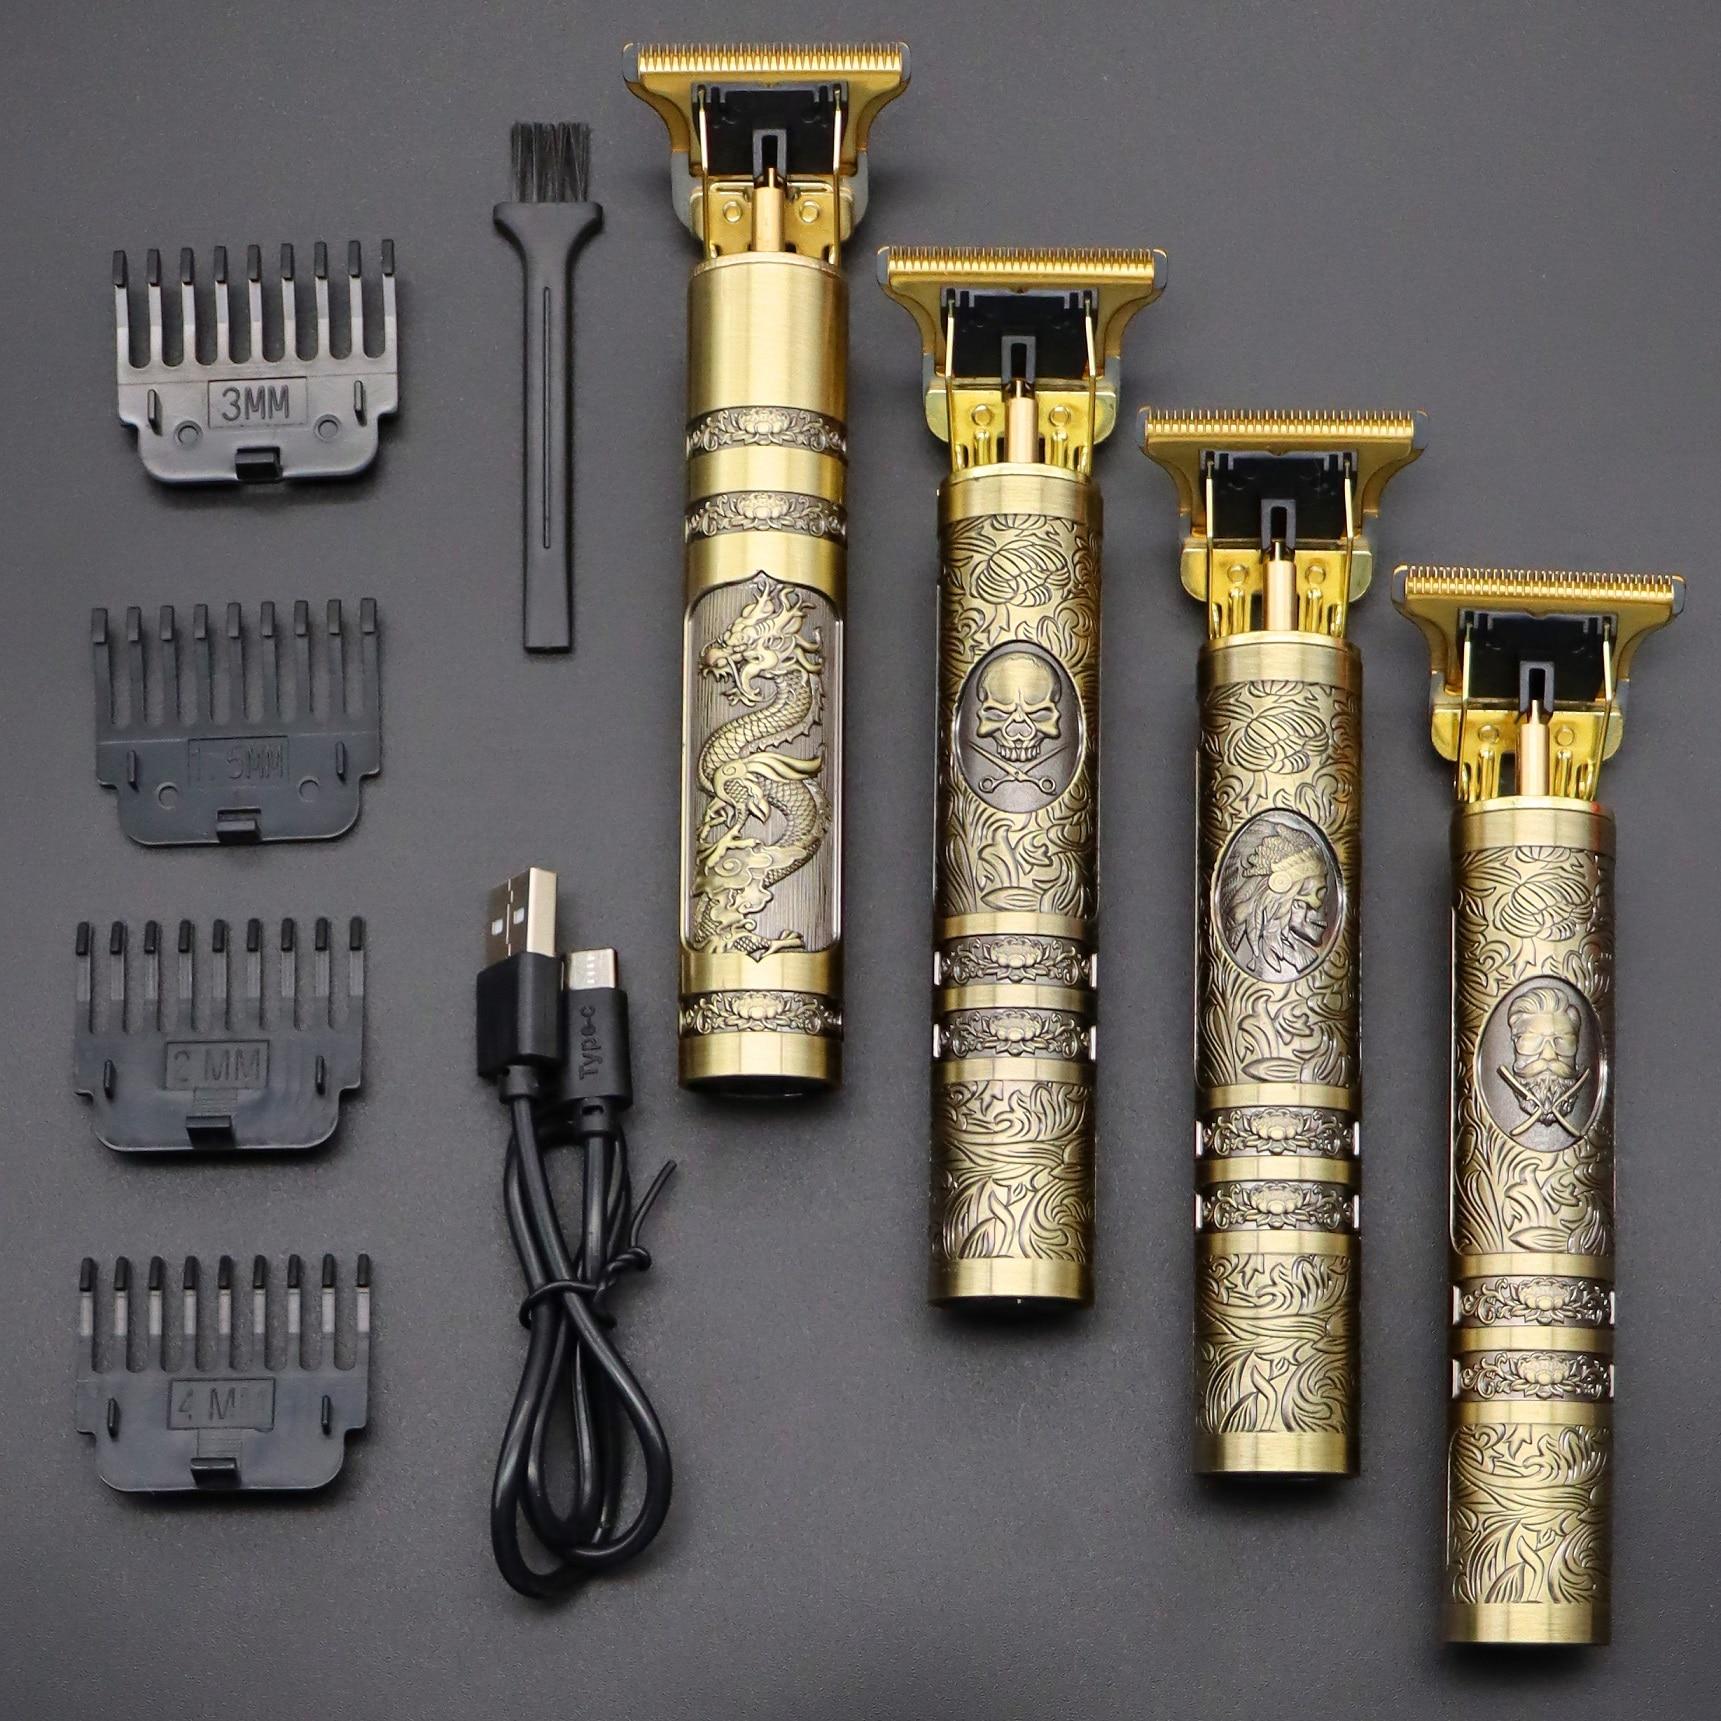 2020 USB T9 Hair Clipper Professional Electric hair trimmer  Barber Shaver Trimmer Beard 0mm Men Hai